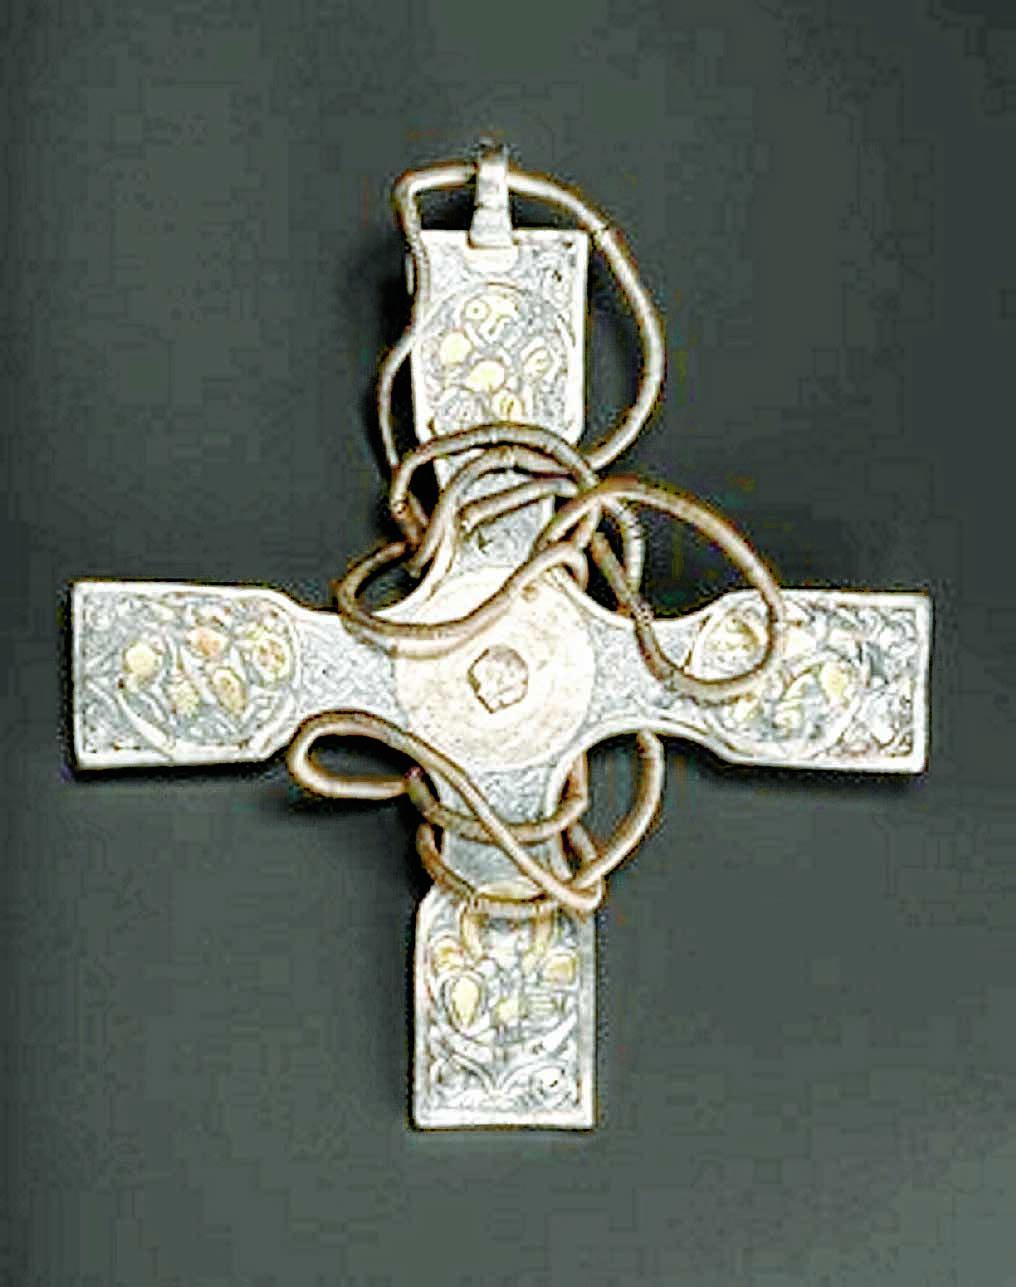 Rare ancient cross restored to full glory